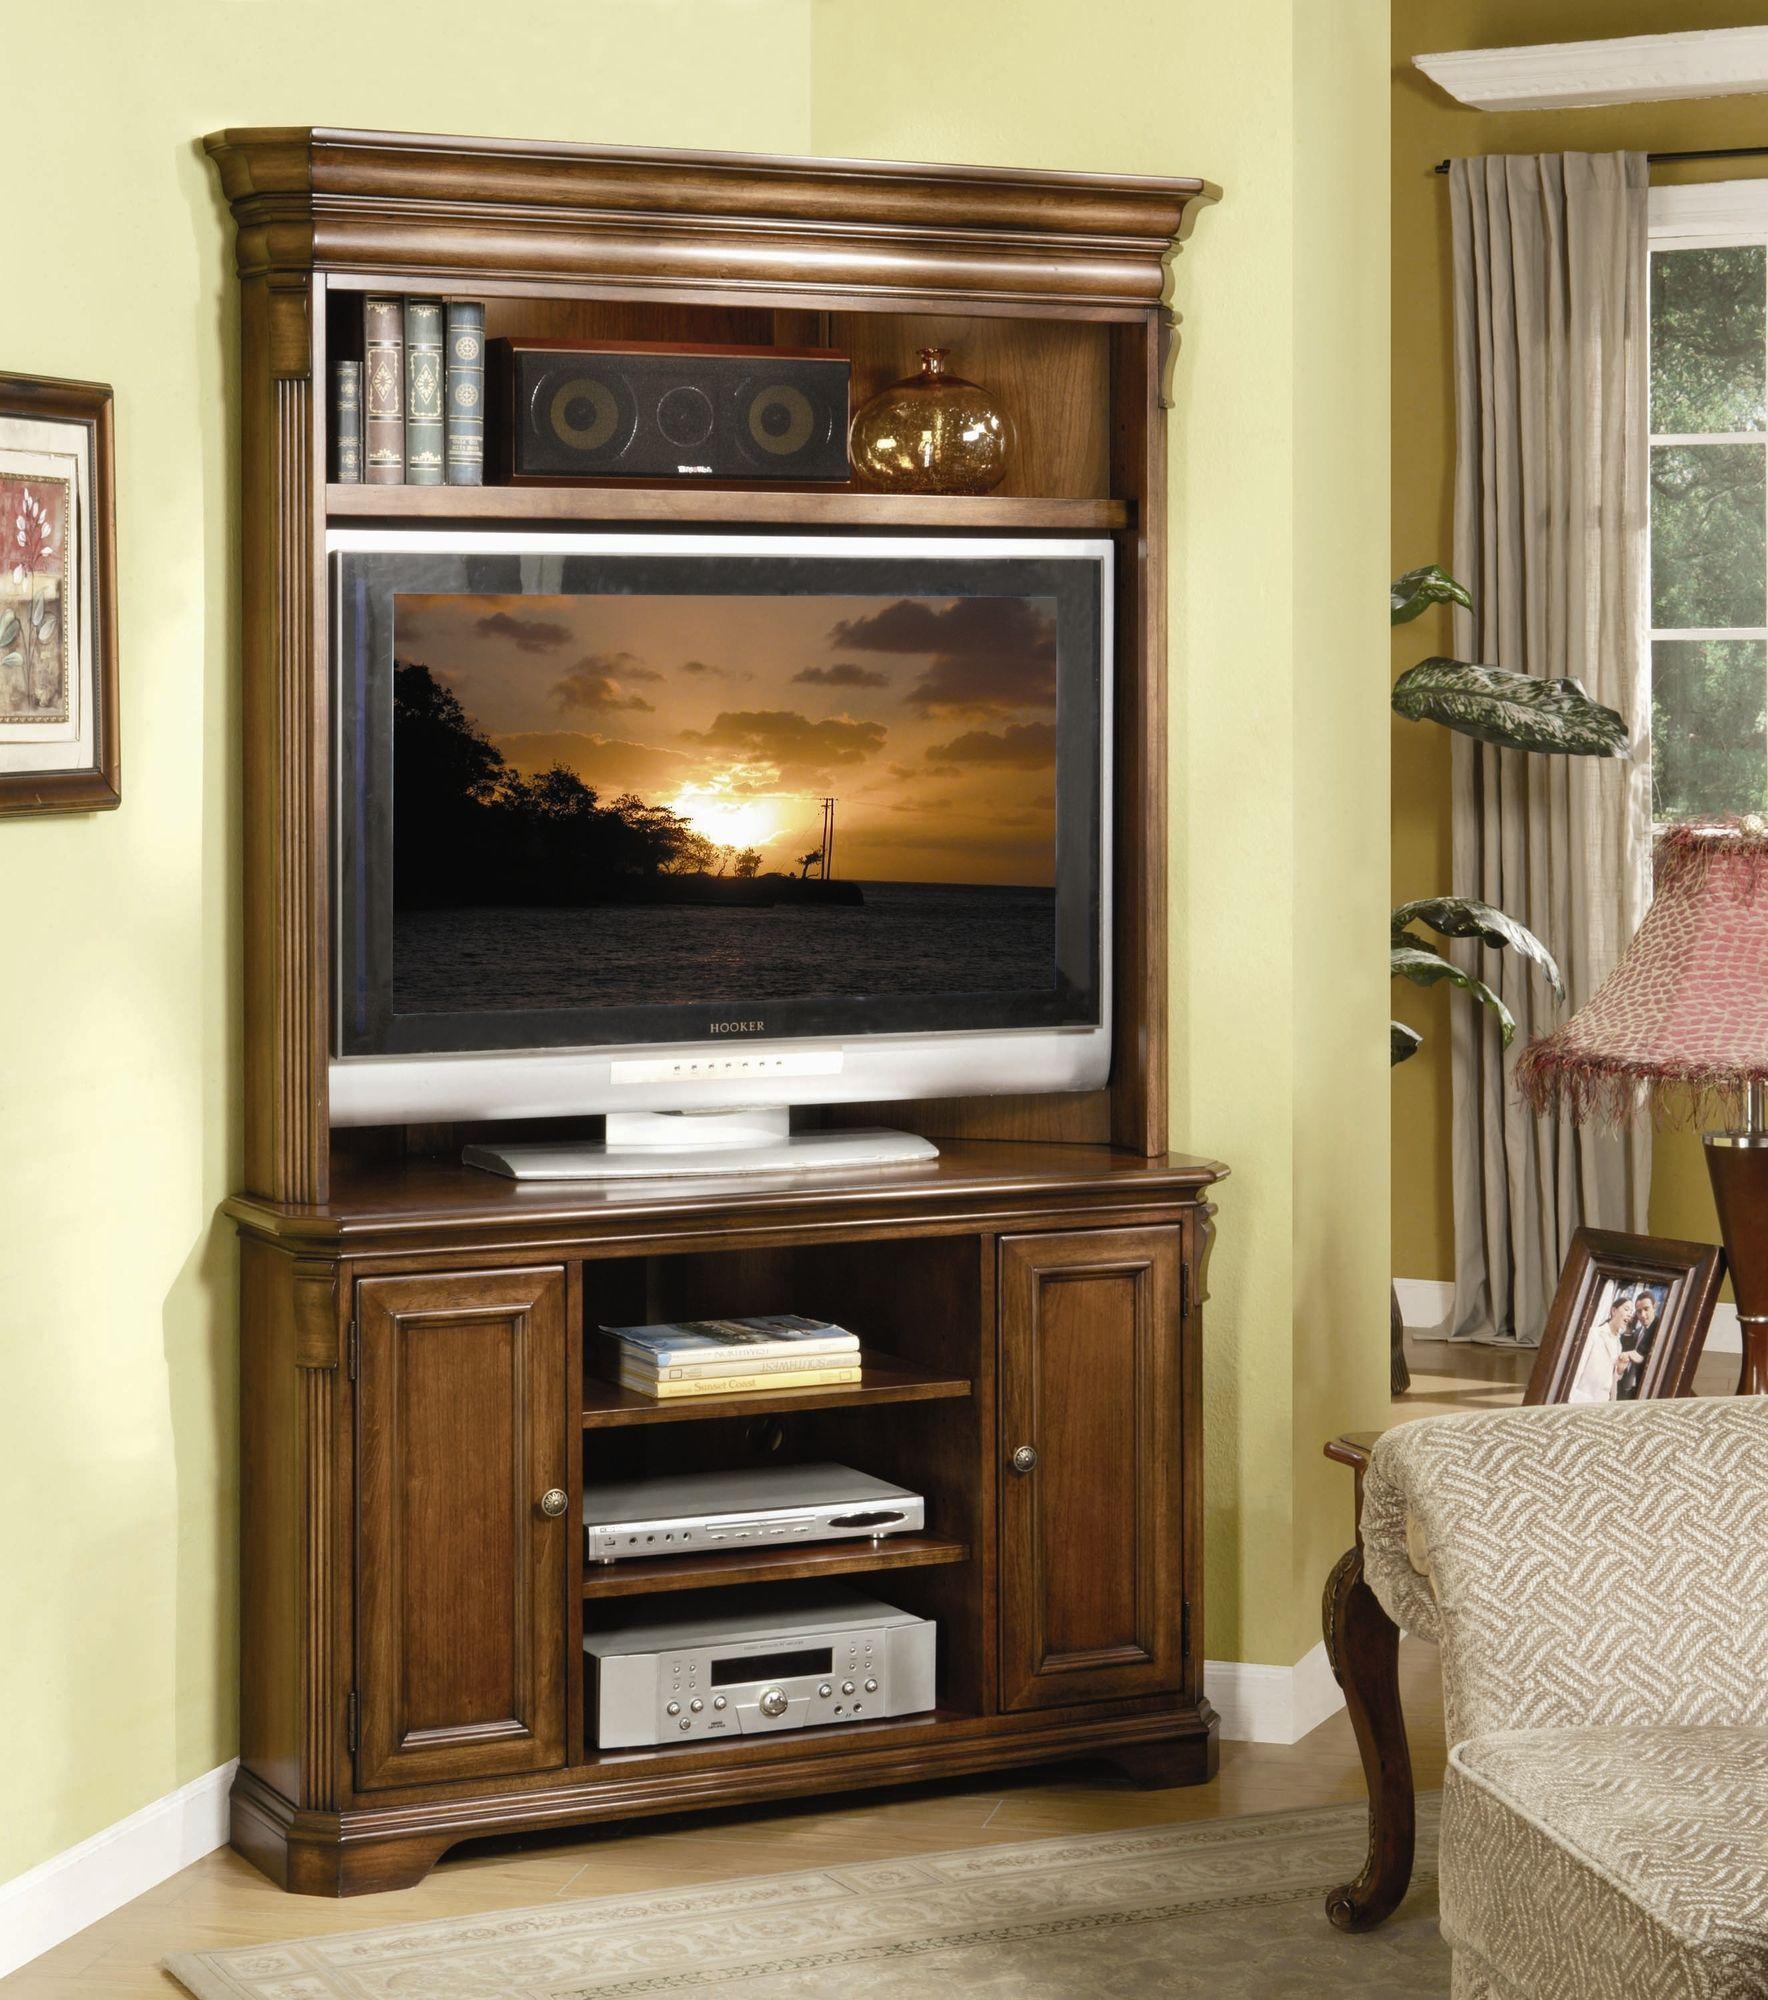 hooker furniture entertainment center. Idea For Corner TV Entertainment Center Hooker Furniture